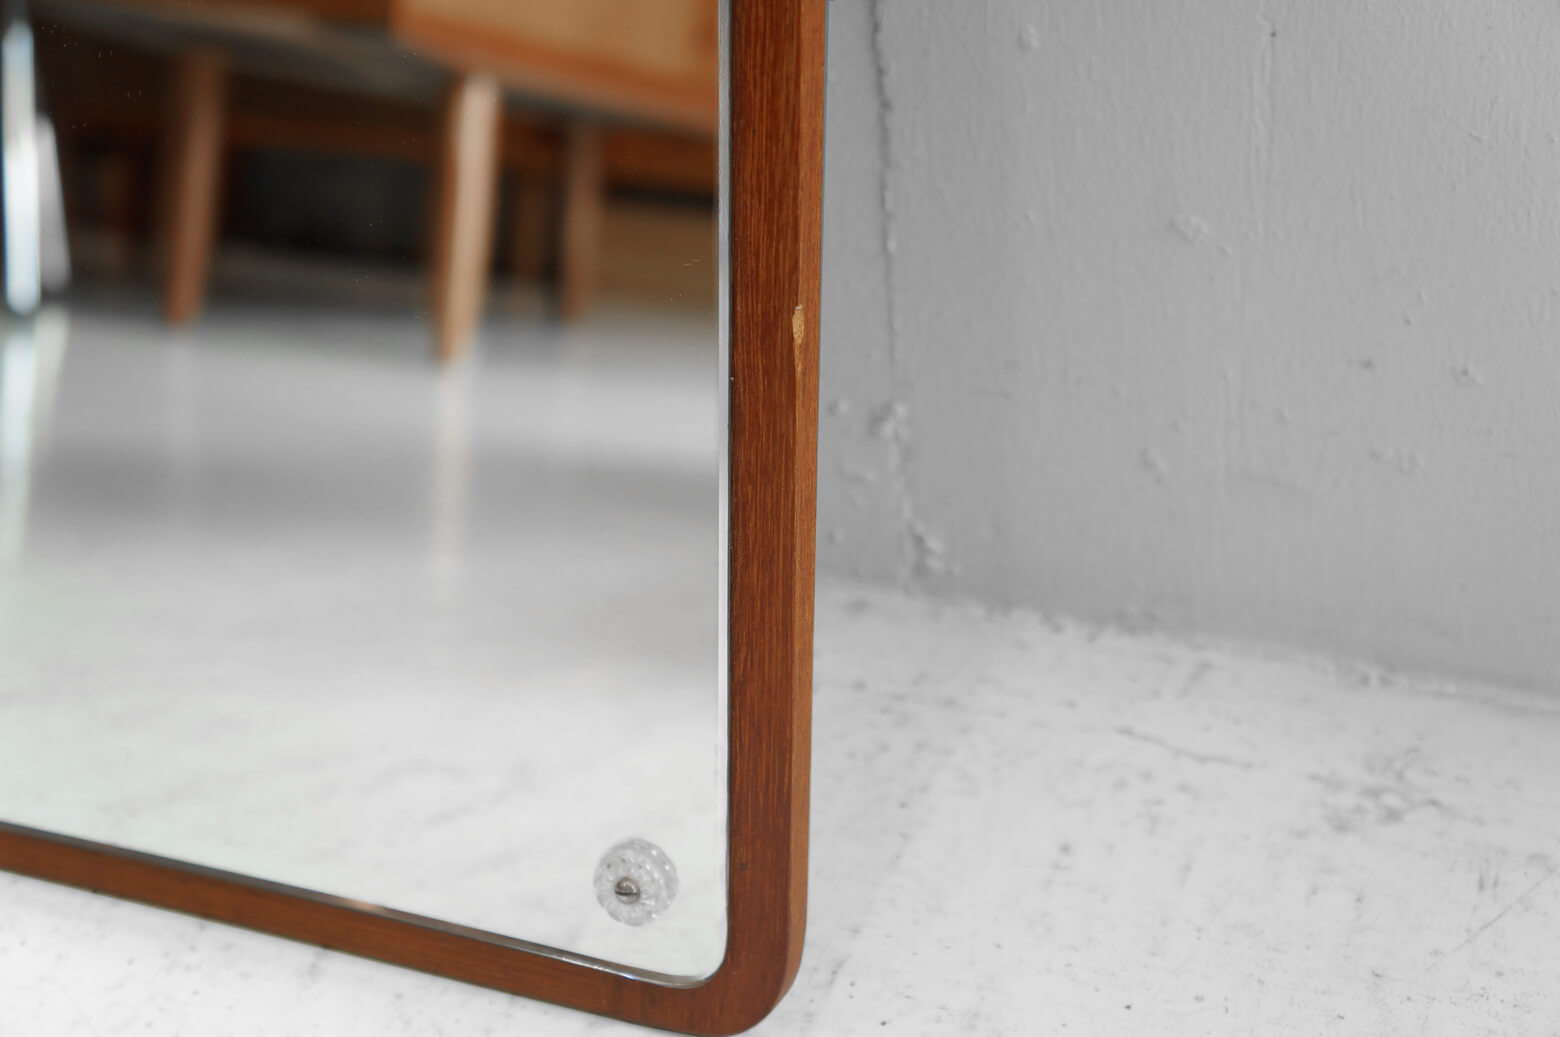 Danish Vintage Teakwood Wall Mirror/デンマーク ヴィンテージ チーク材 ウォールミラー